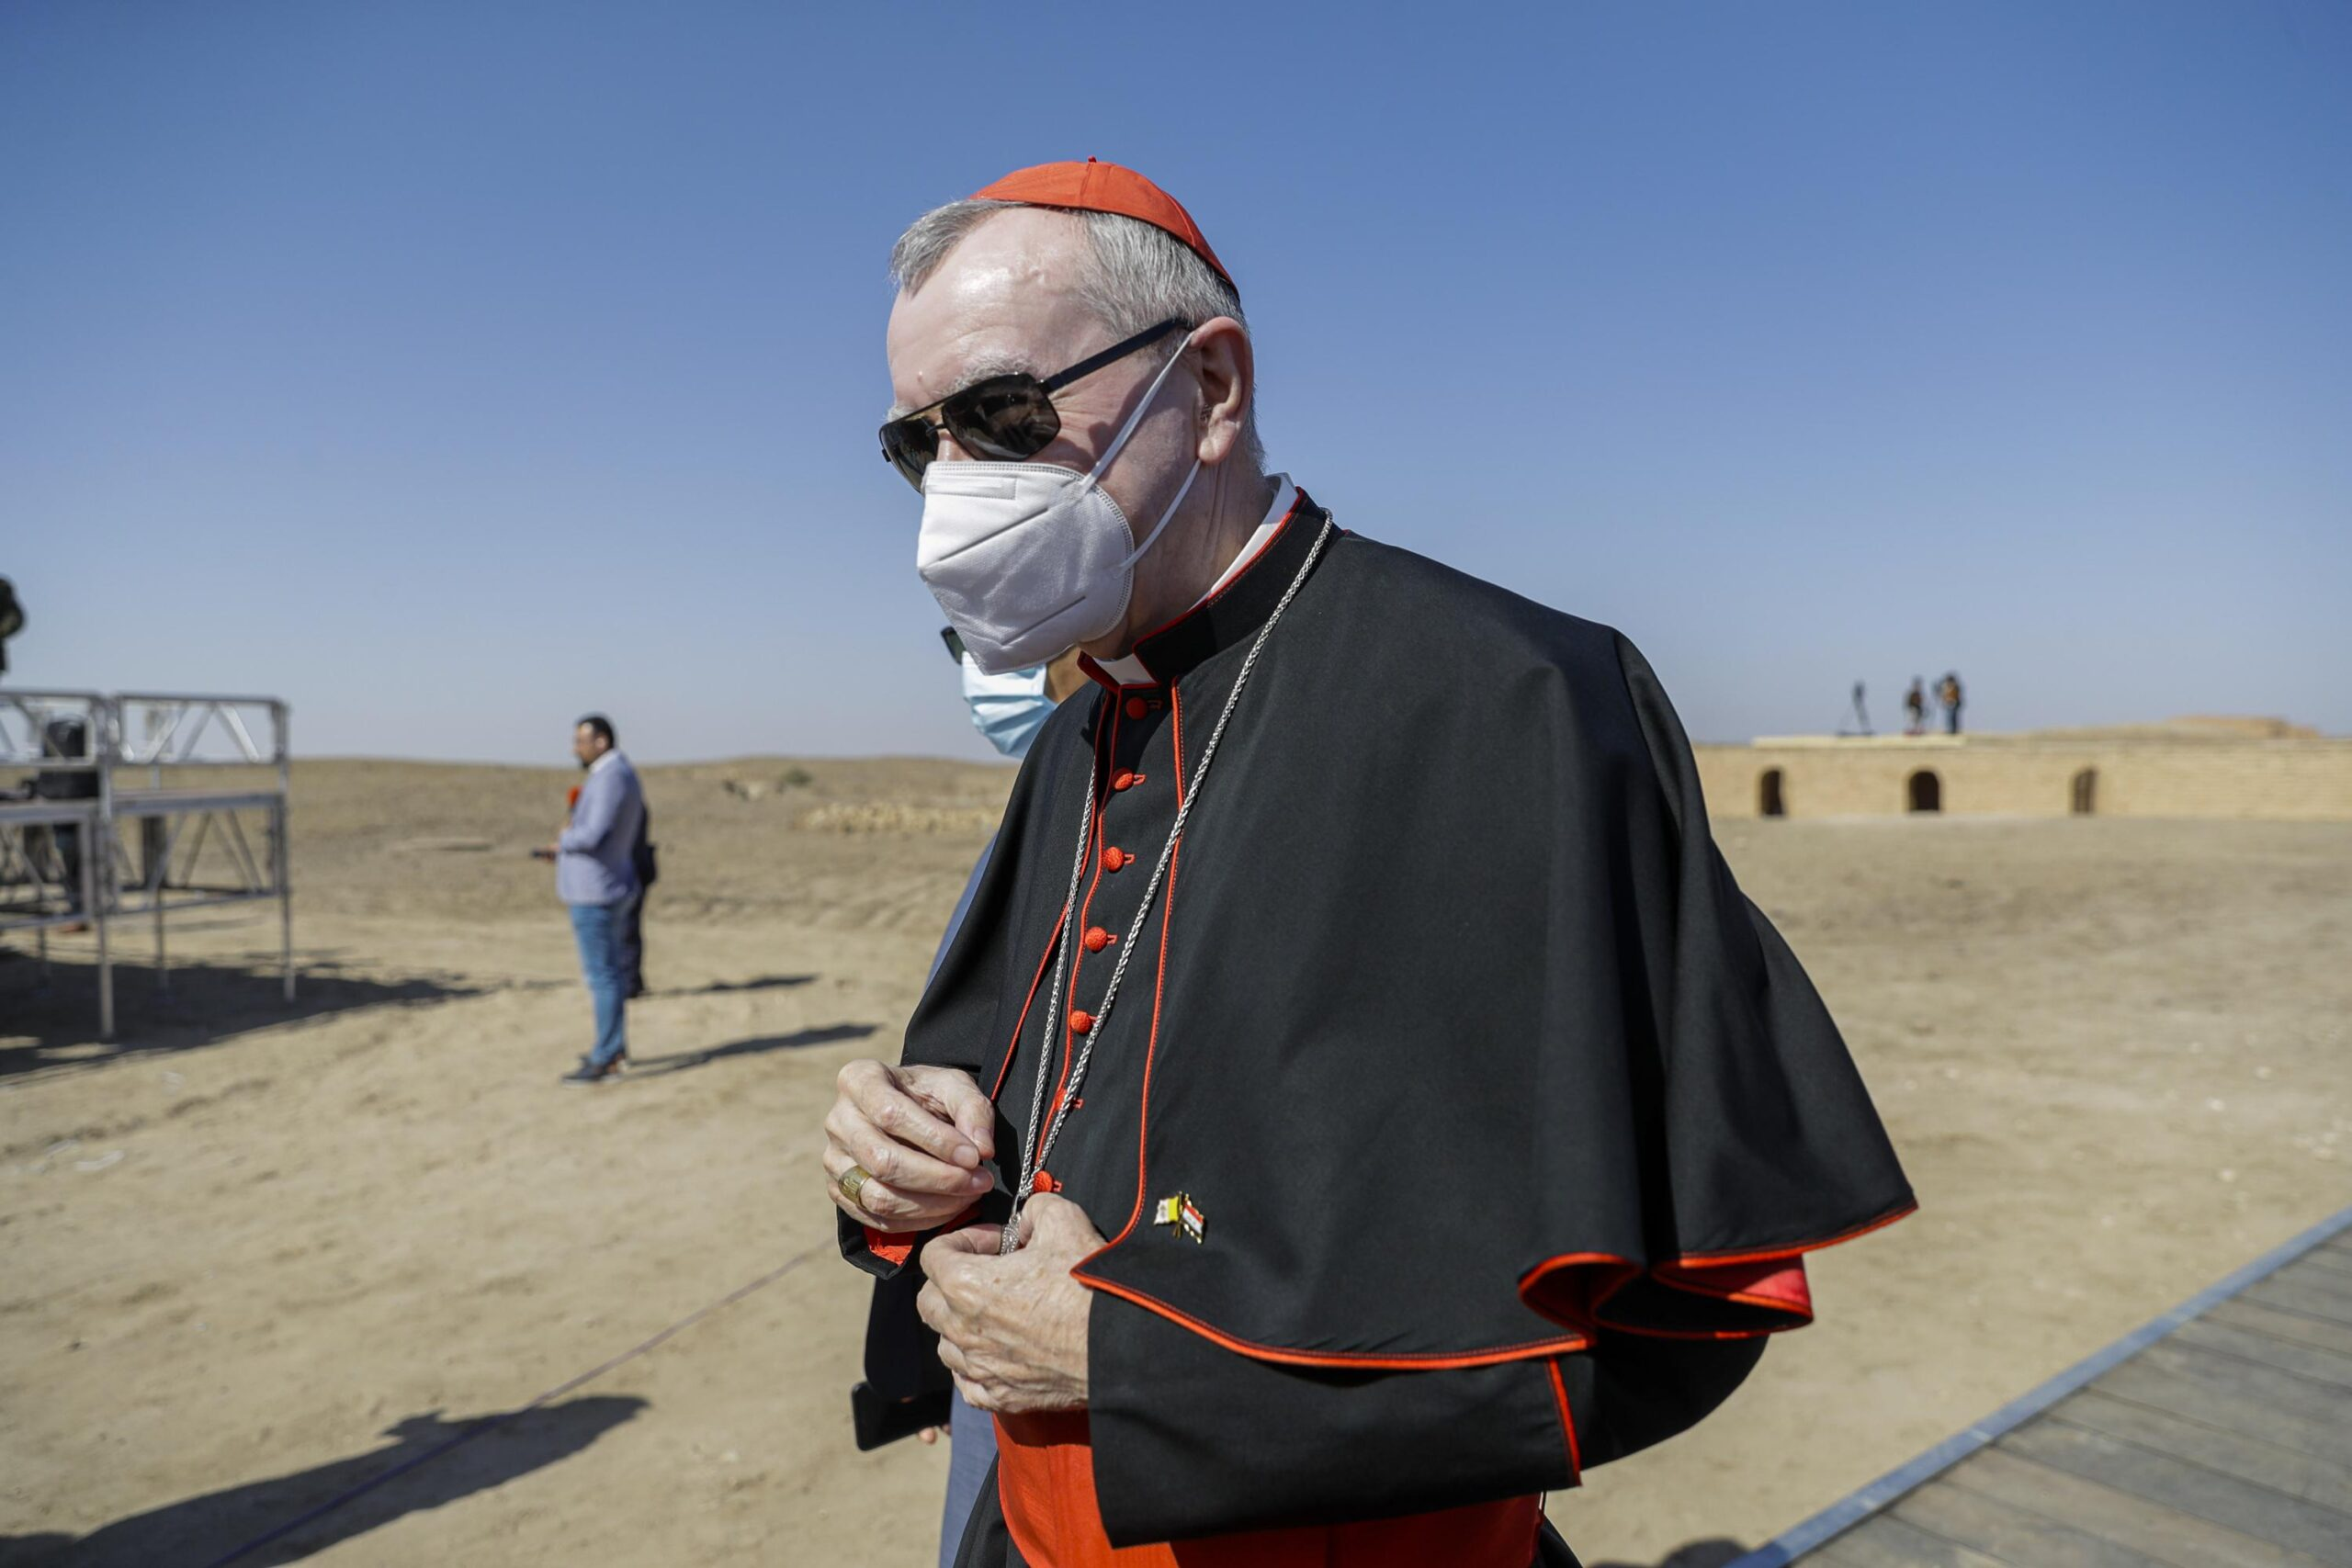 Vatican No 2 skips trip to Venezuela, cites pandemic